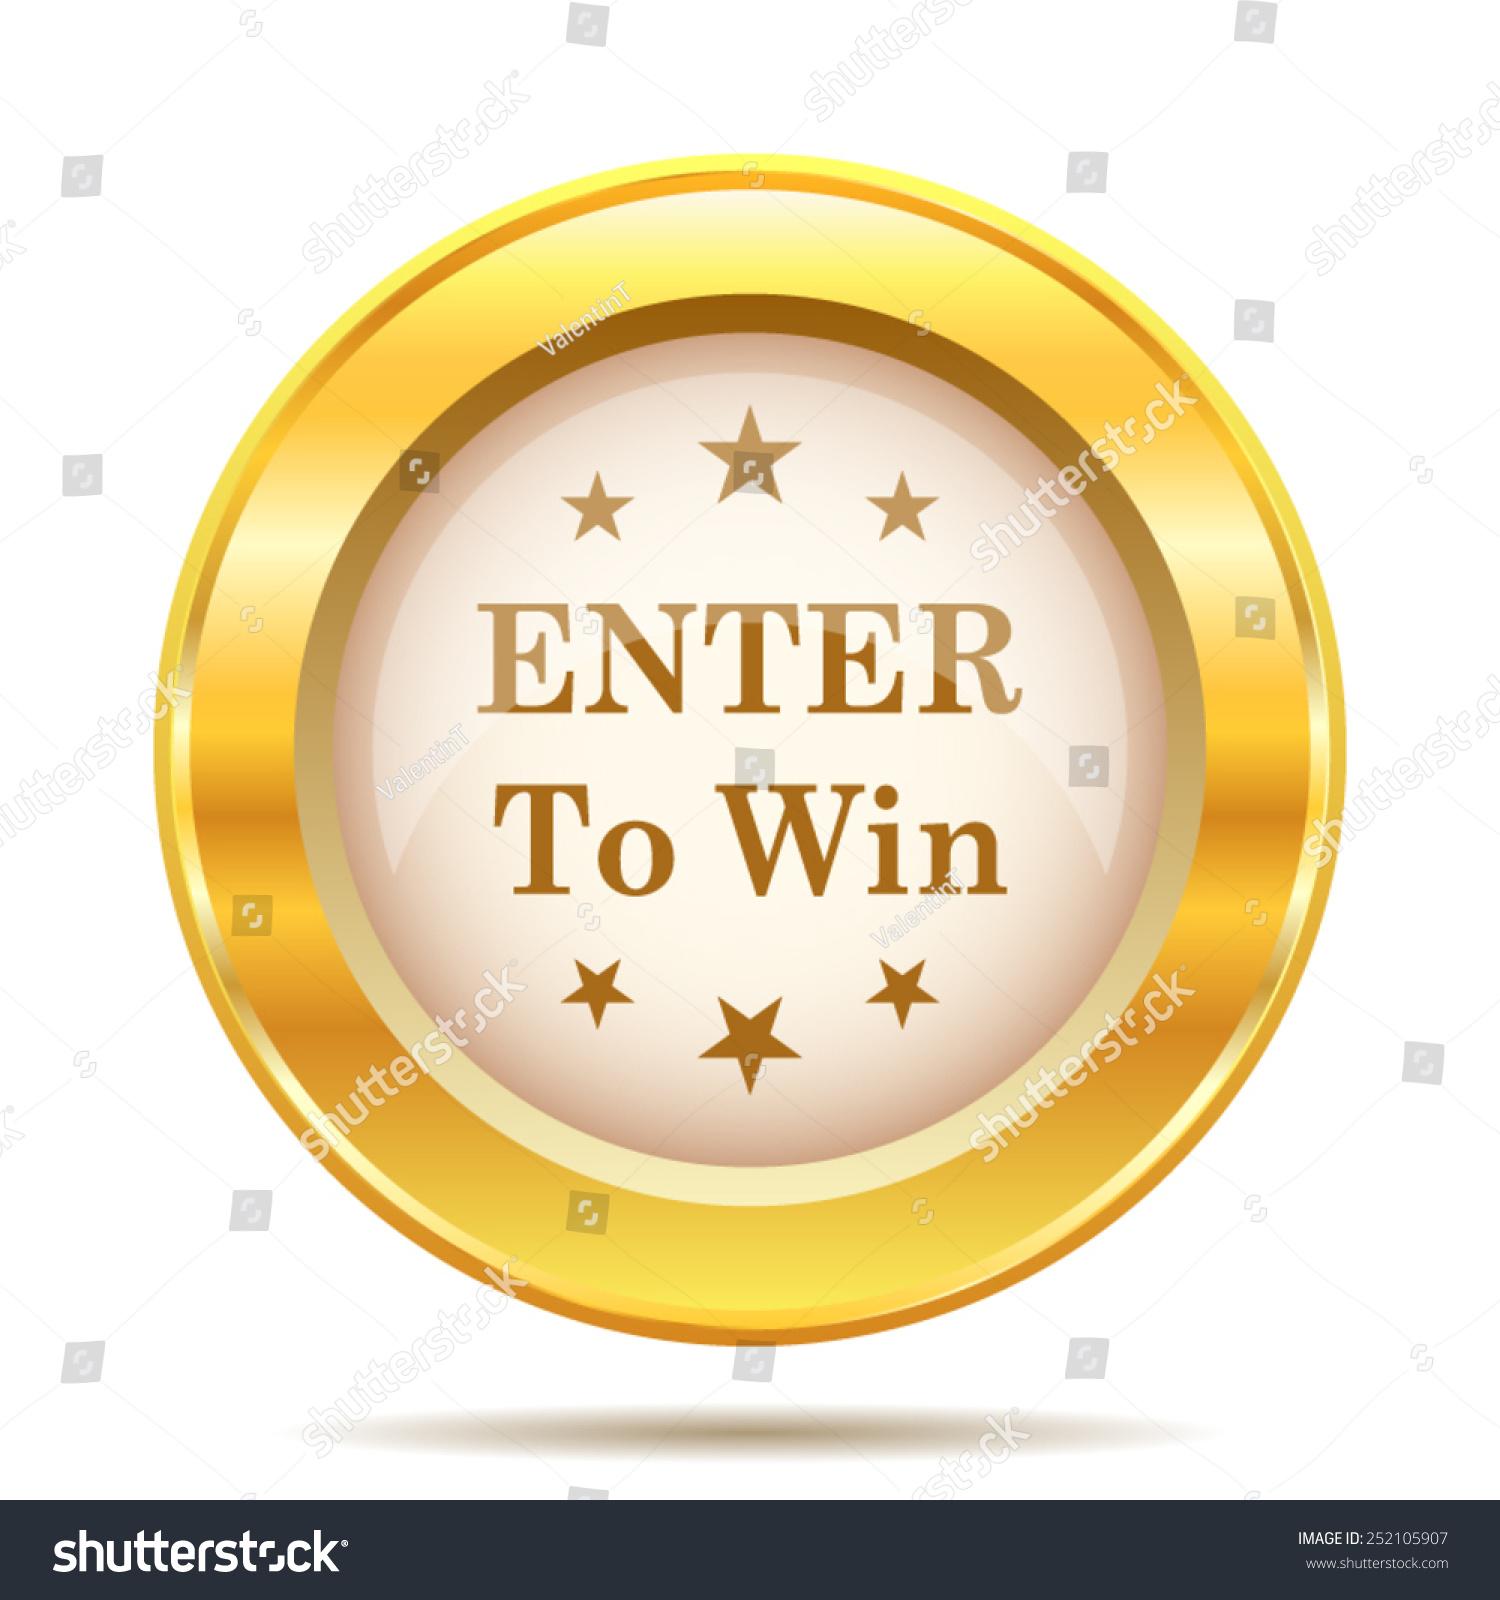 Acting, award, best, champ, model, reward, win icon | Icon search ...